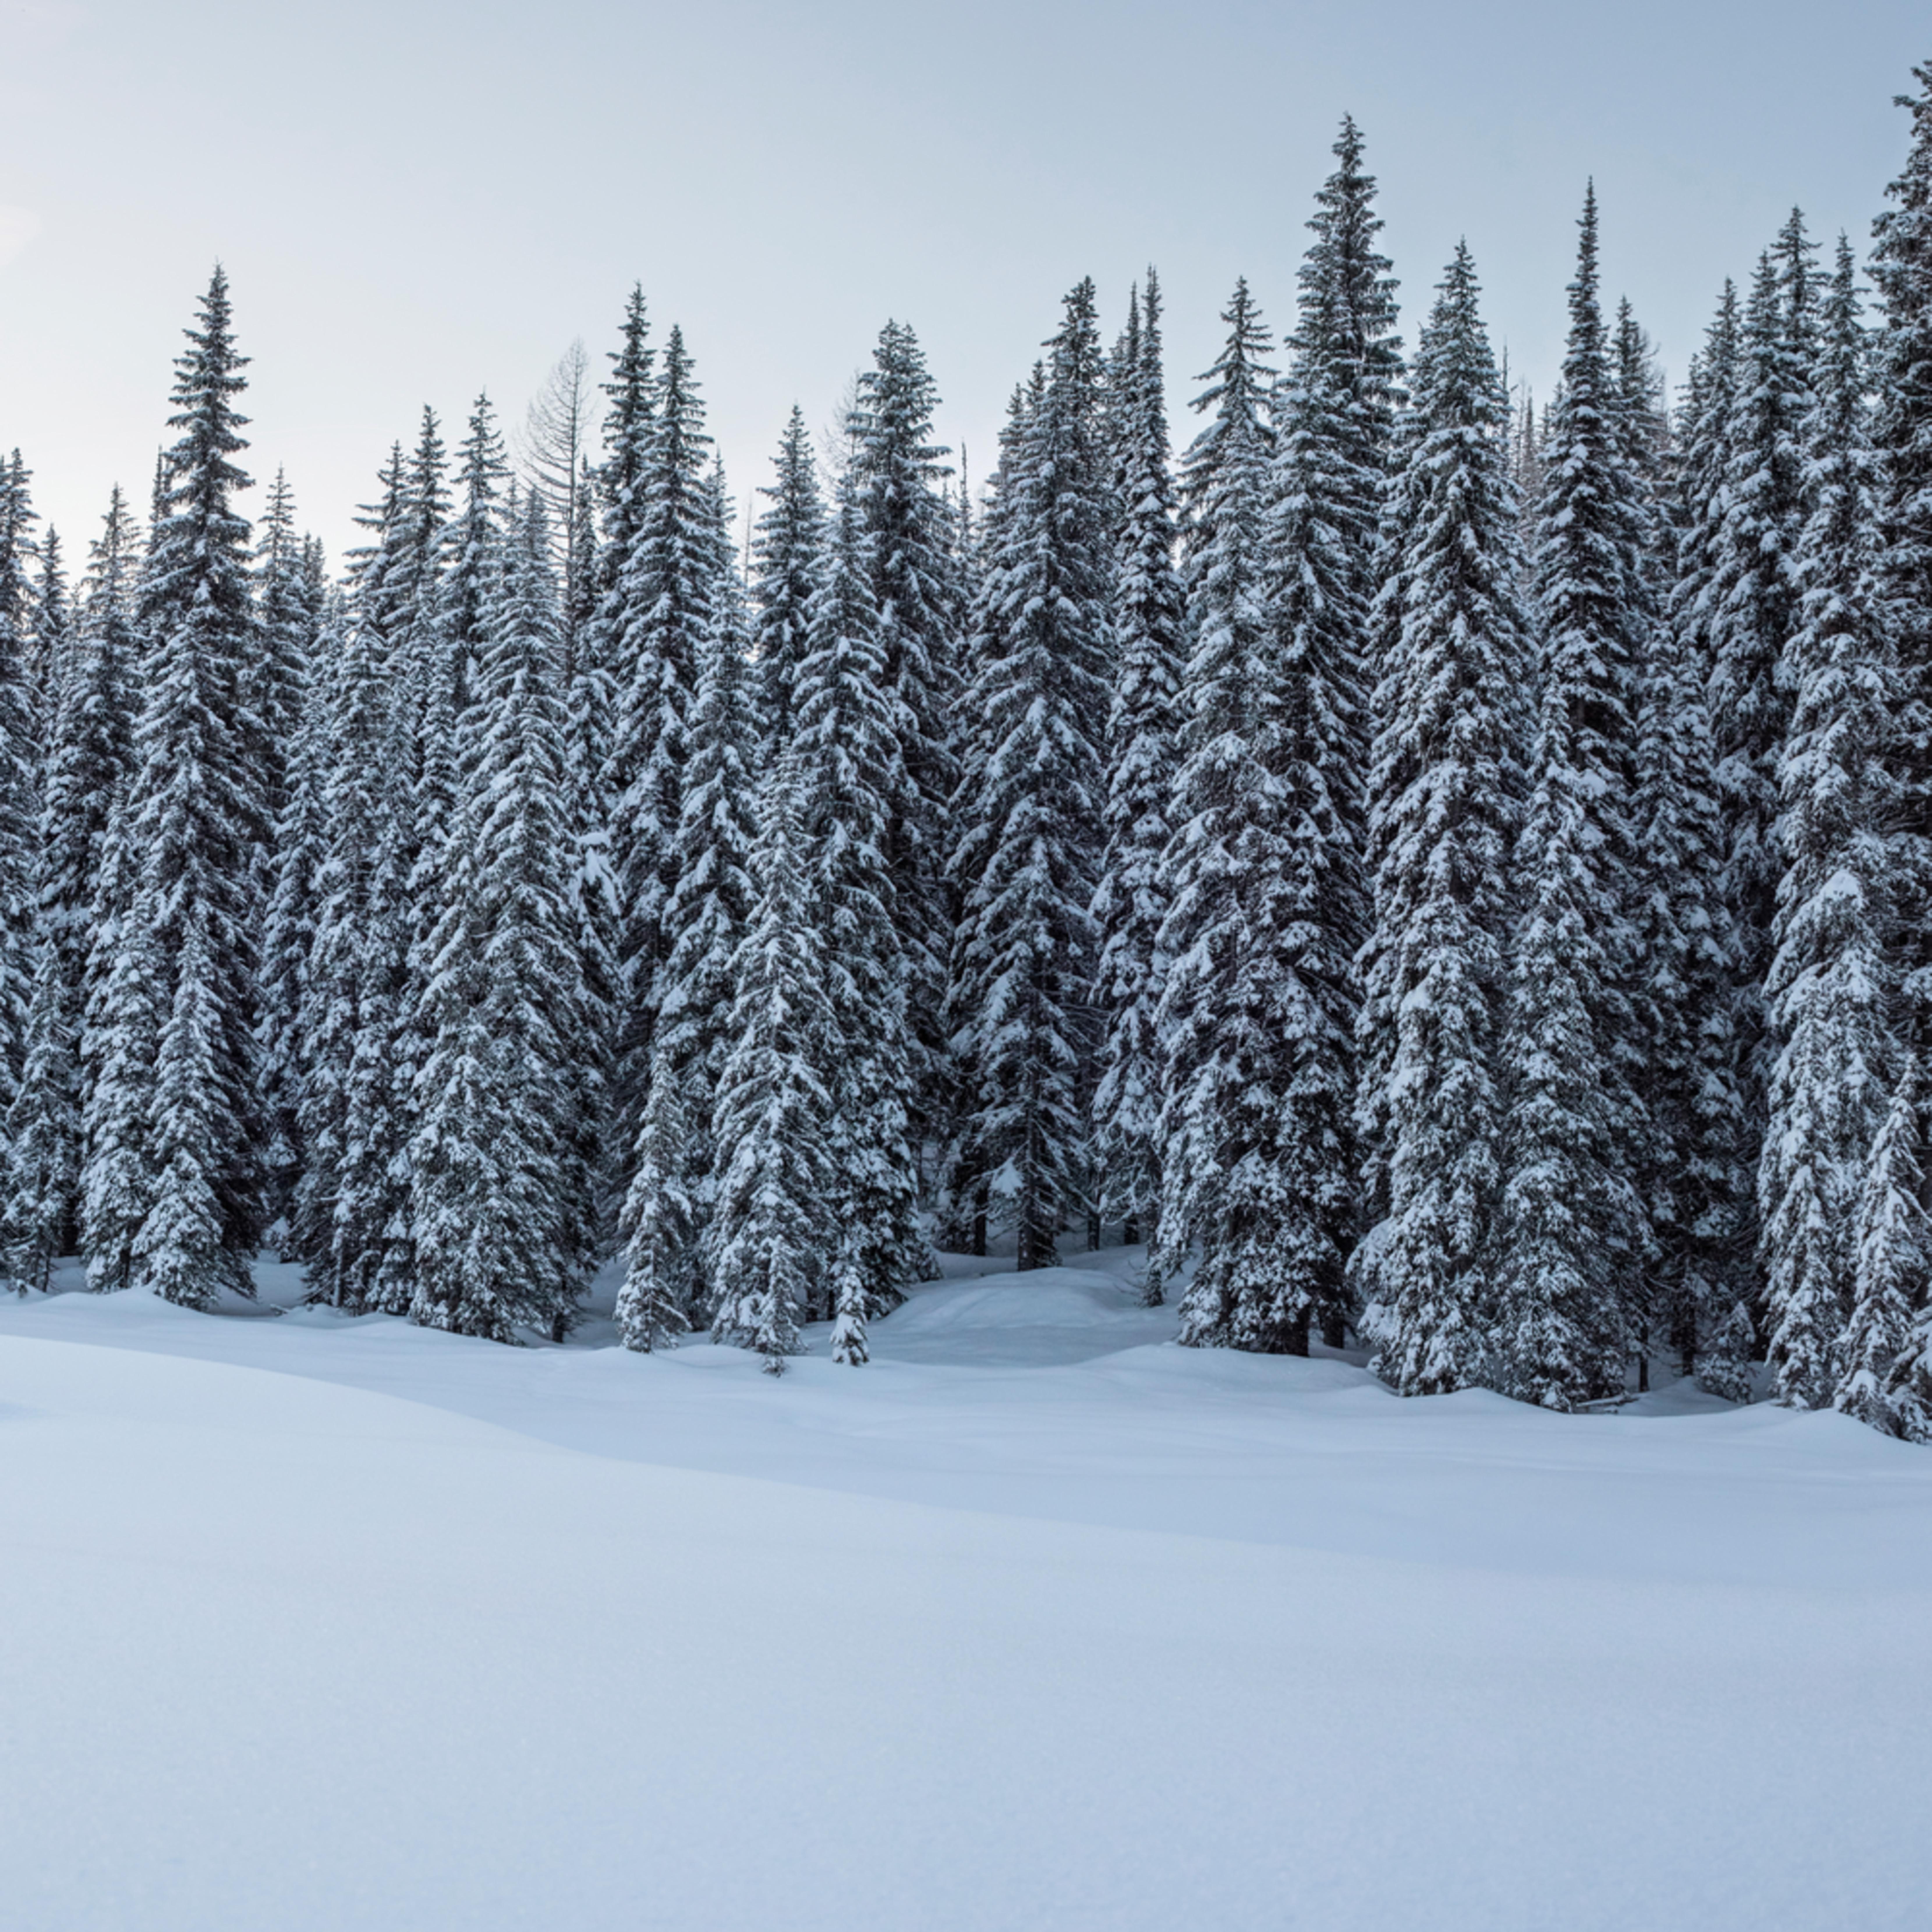 Lolo pass snowy trees p15nol